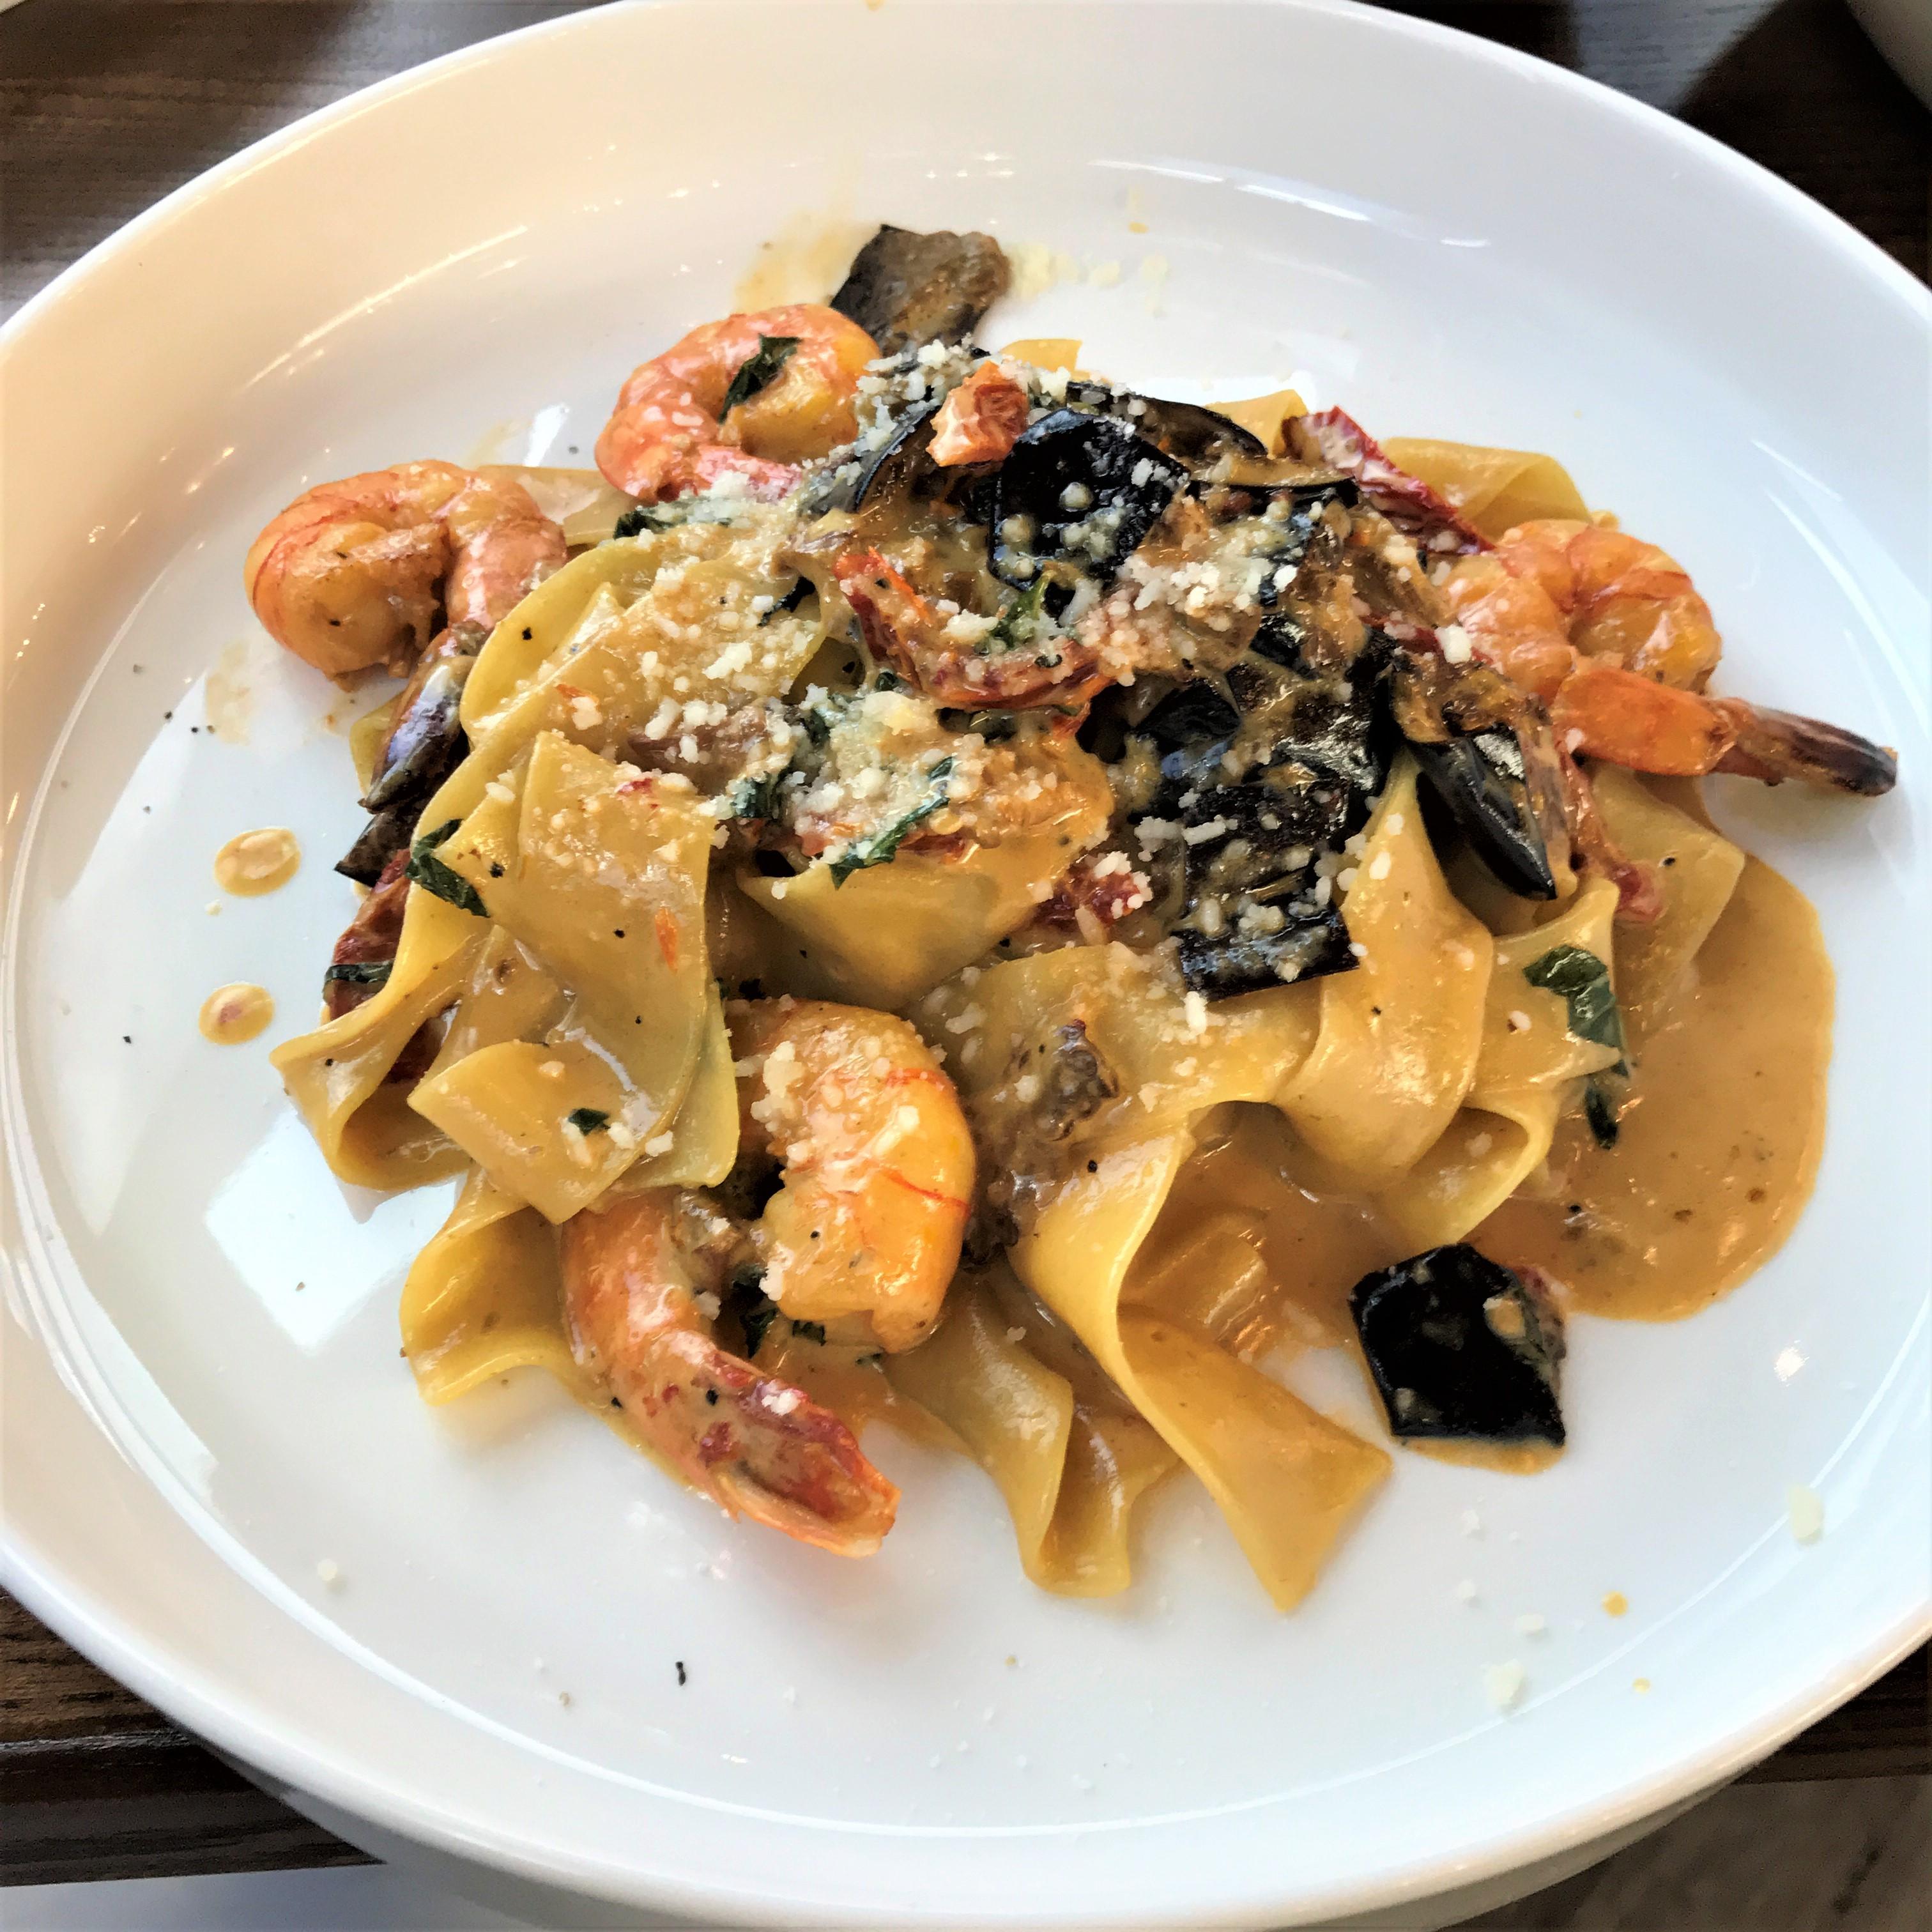 Encantador Tx Malai Cocina Dallas Molde - Como Decorar la Cocina ...